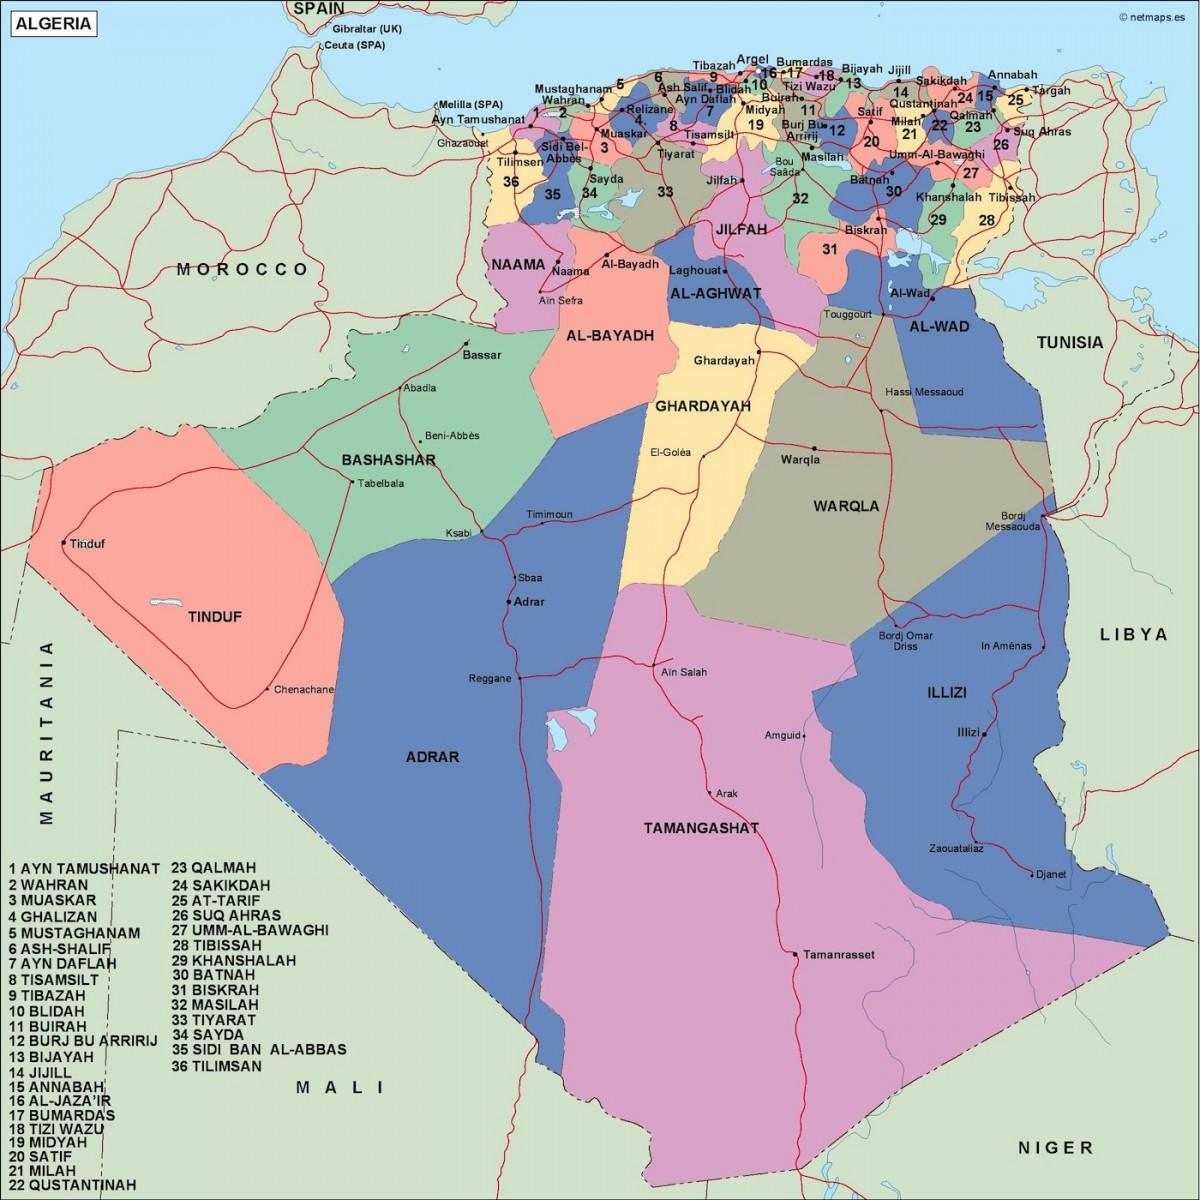 algeria political map. Vector Eps maps. Eps Illustrator Map | Vector ...